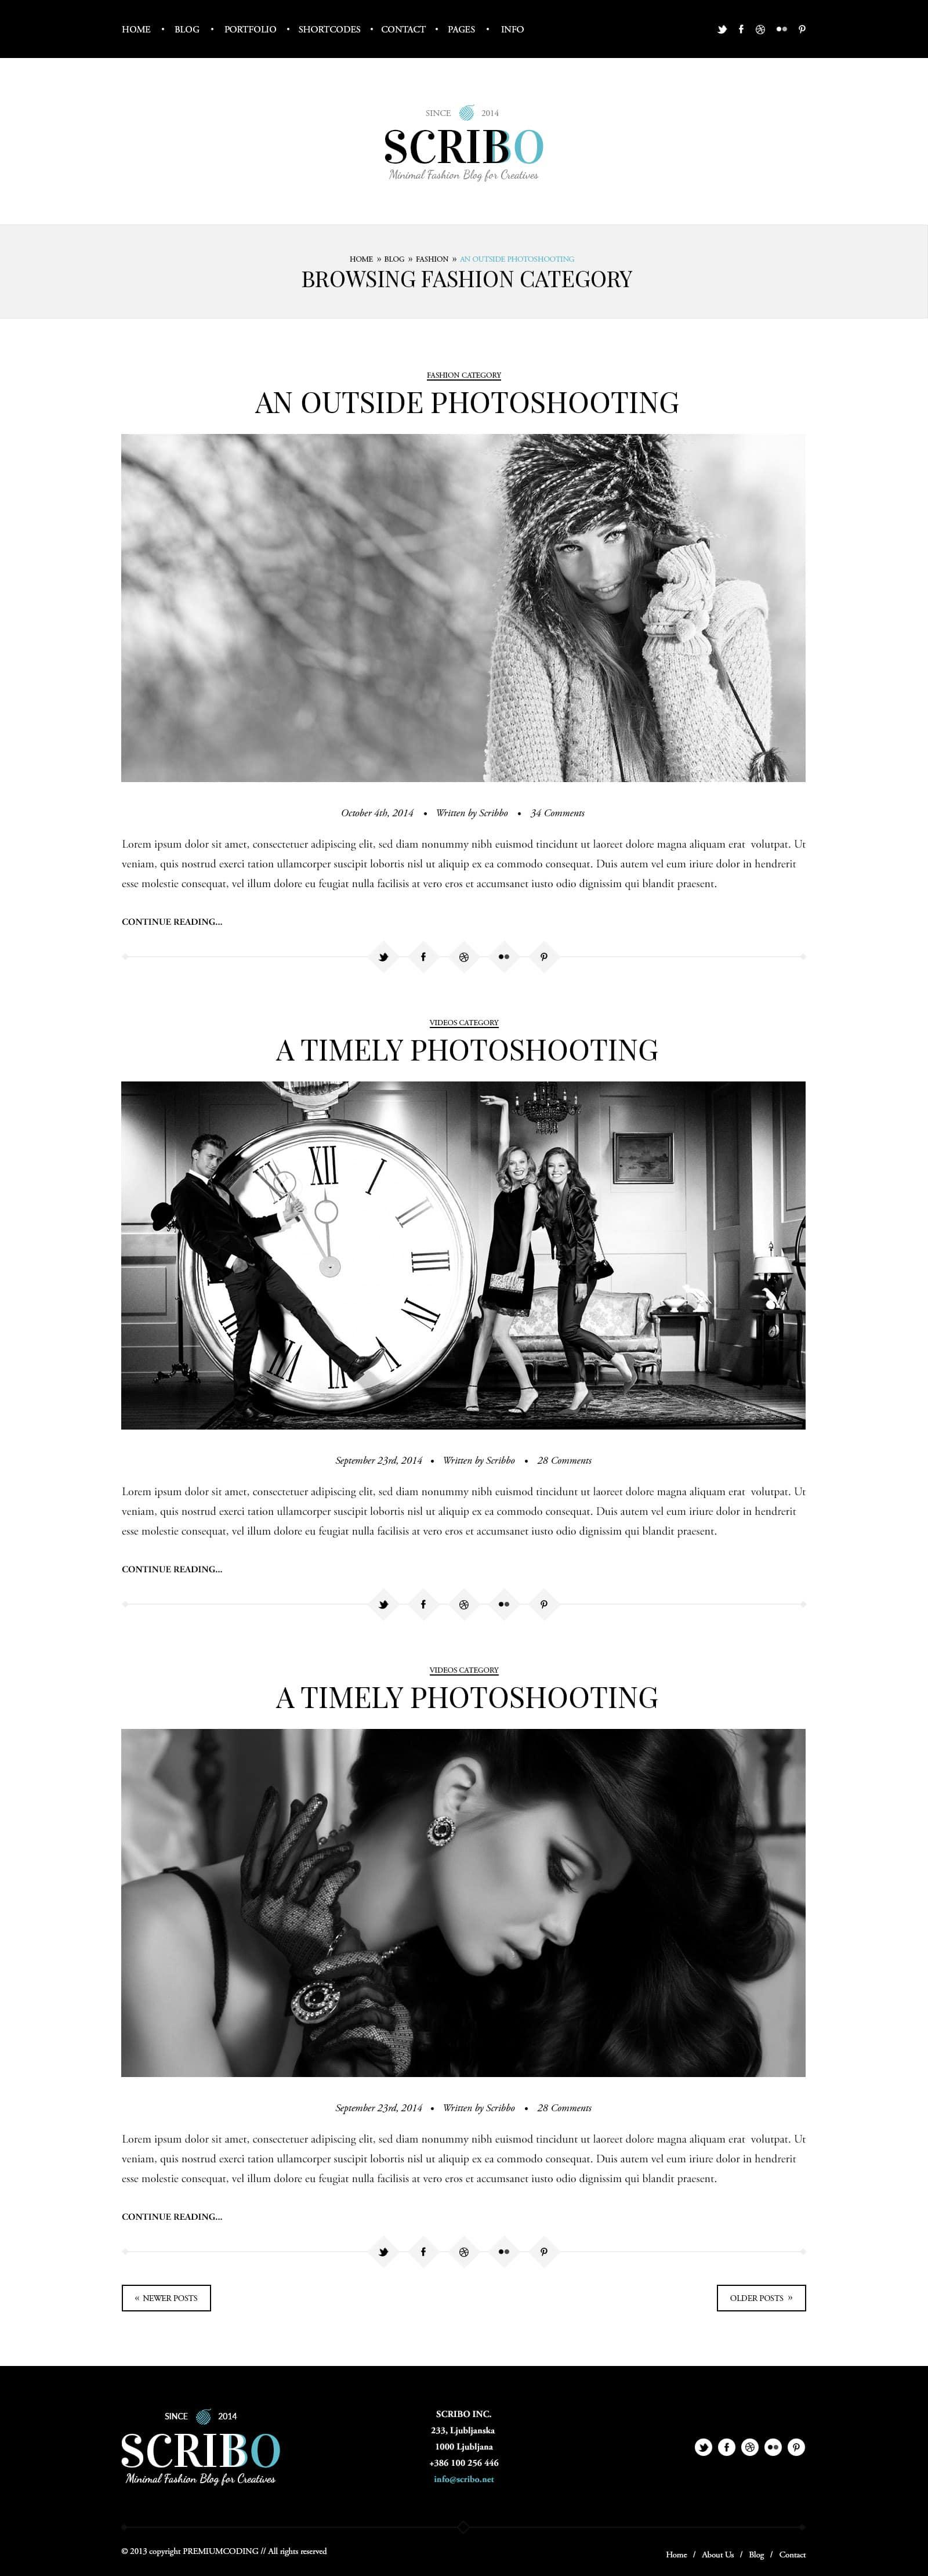 Free Fashion PSD Template Blog Page